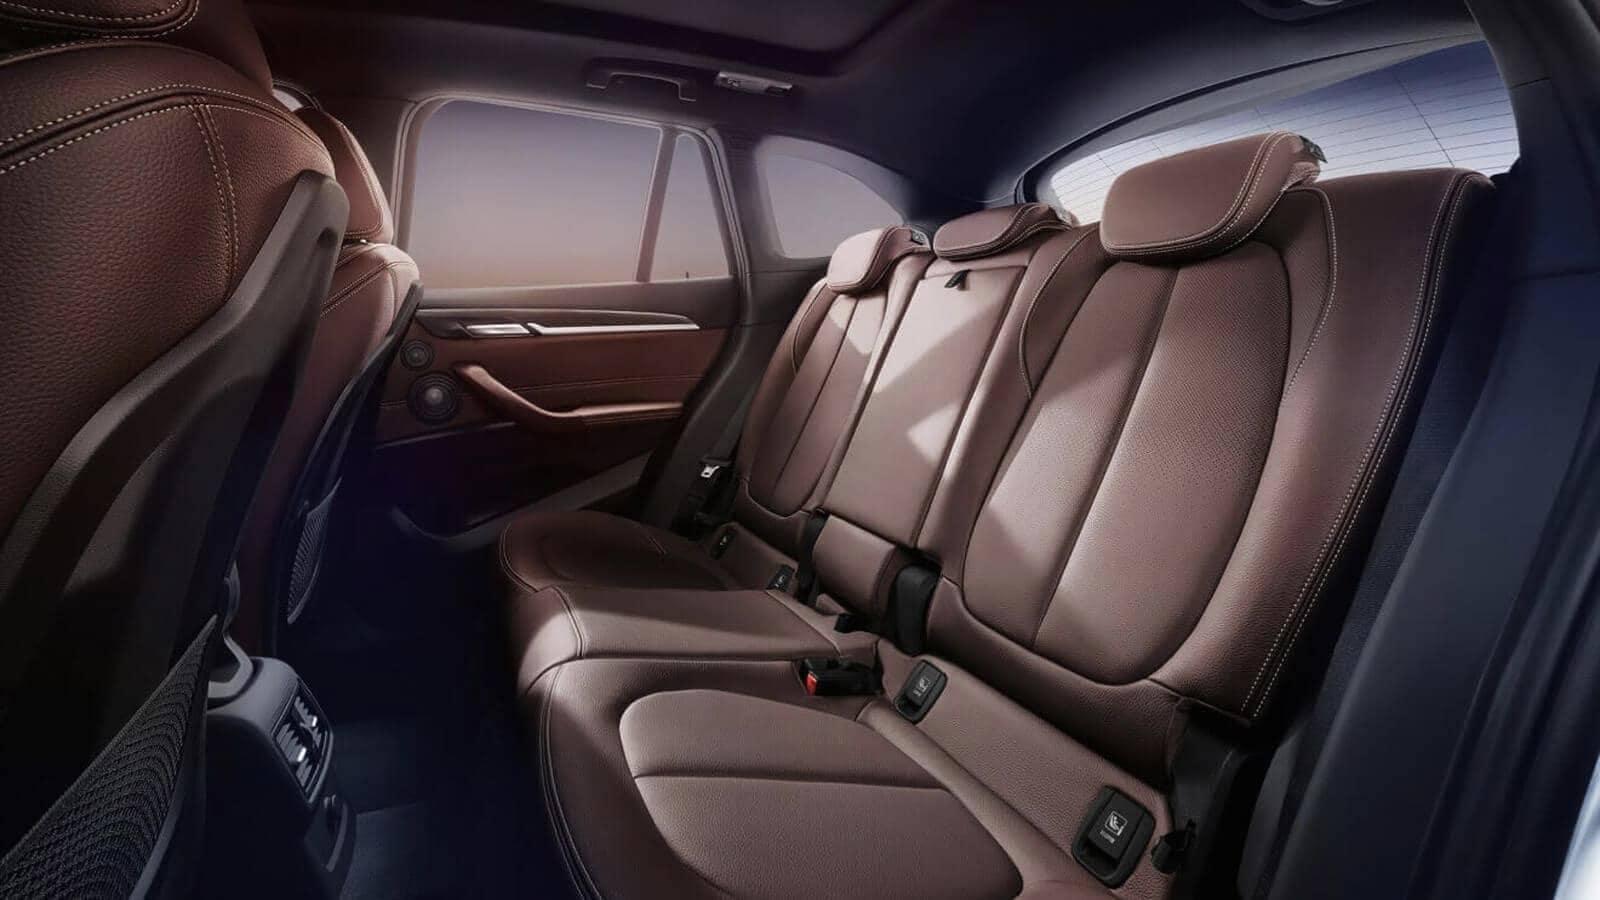 2019 BMW X1 spacious rear row